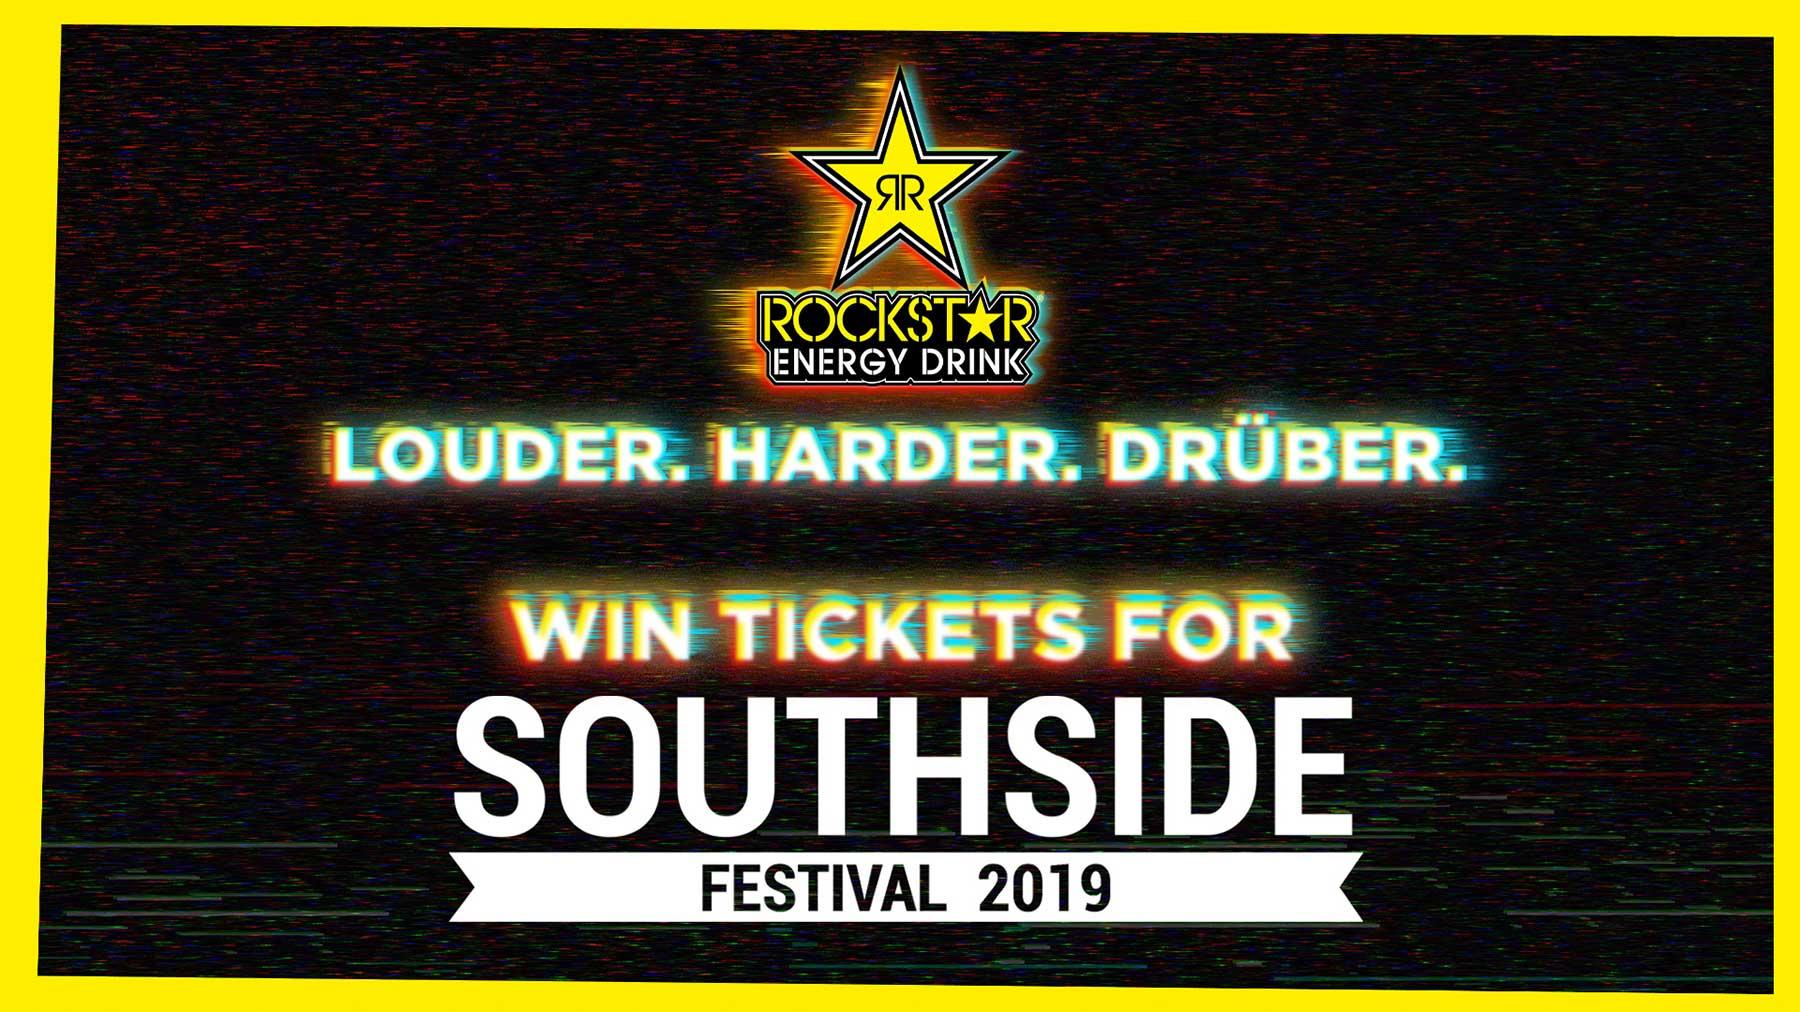 2x3 Tickets für das Southside Festival mit Rockstar Energy rockstar-southside-2019